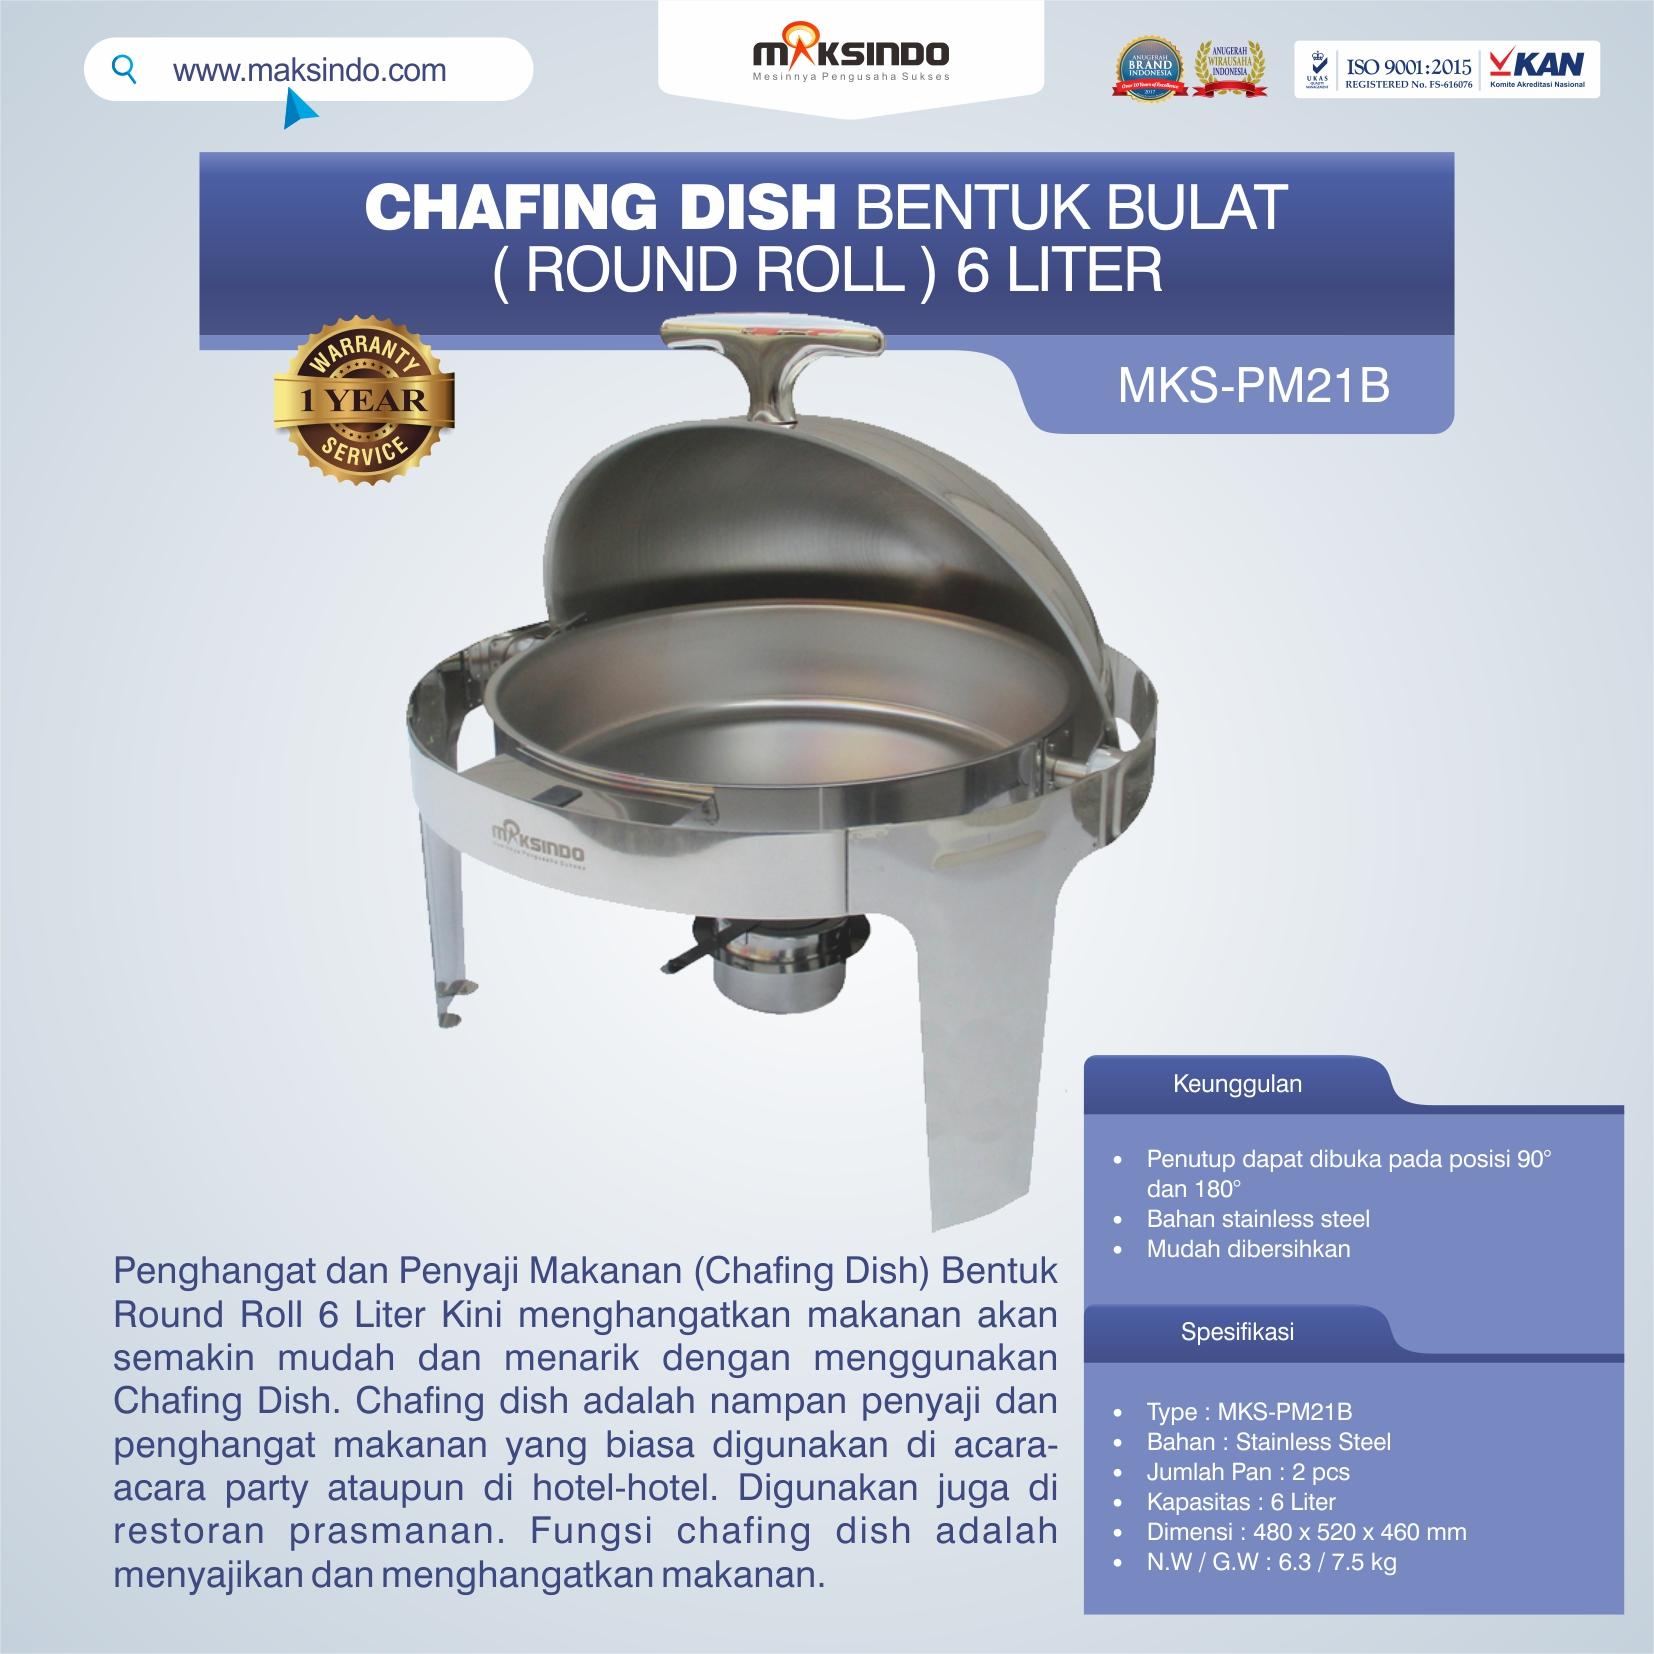 MKS-PM21B Chafing Dish Bentuk Bulat (Round Roll) 6 Liter